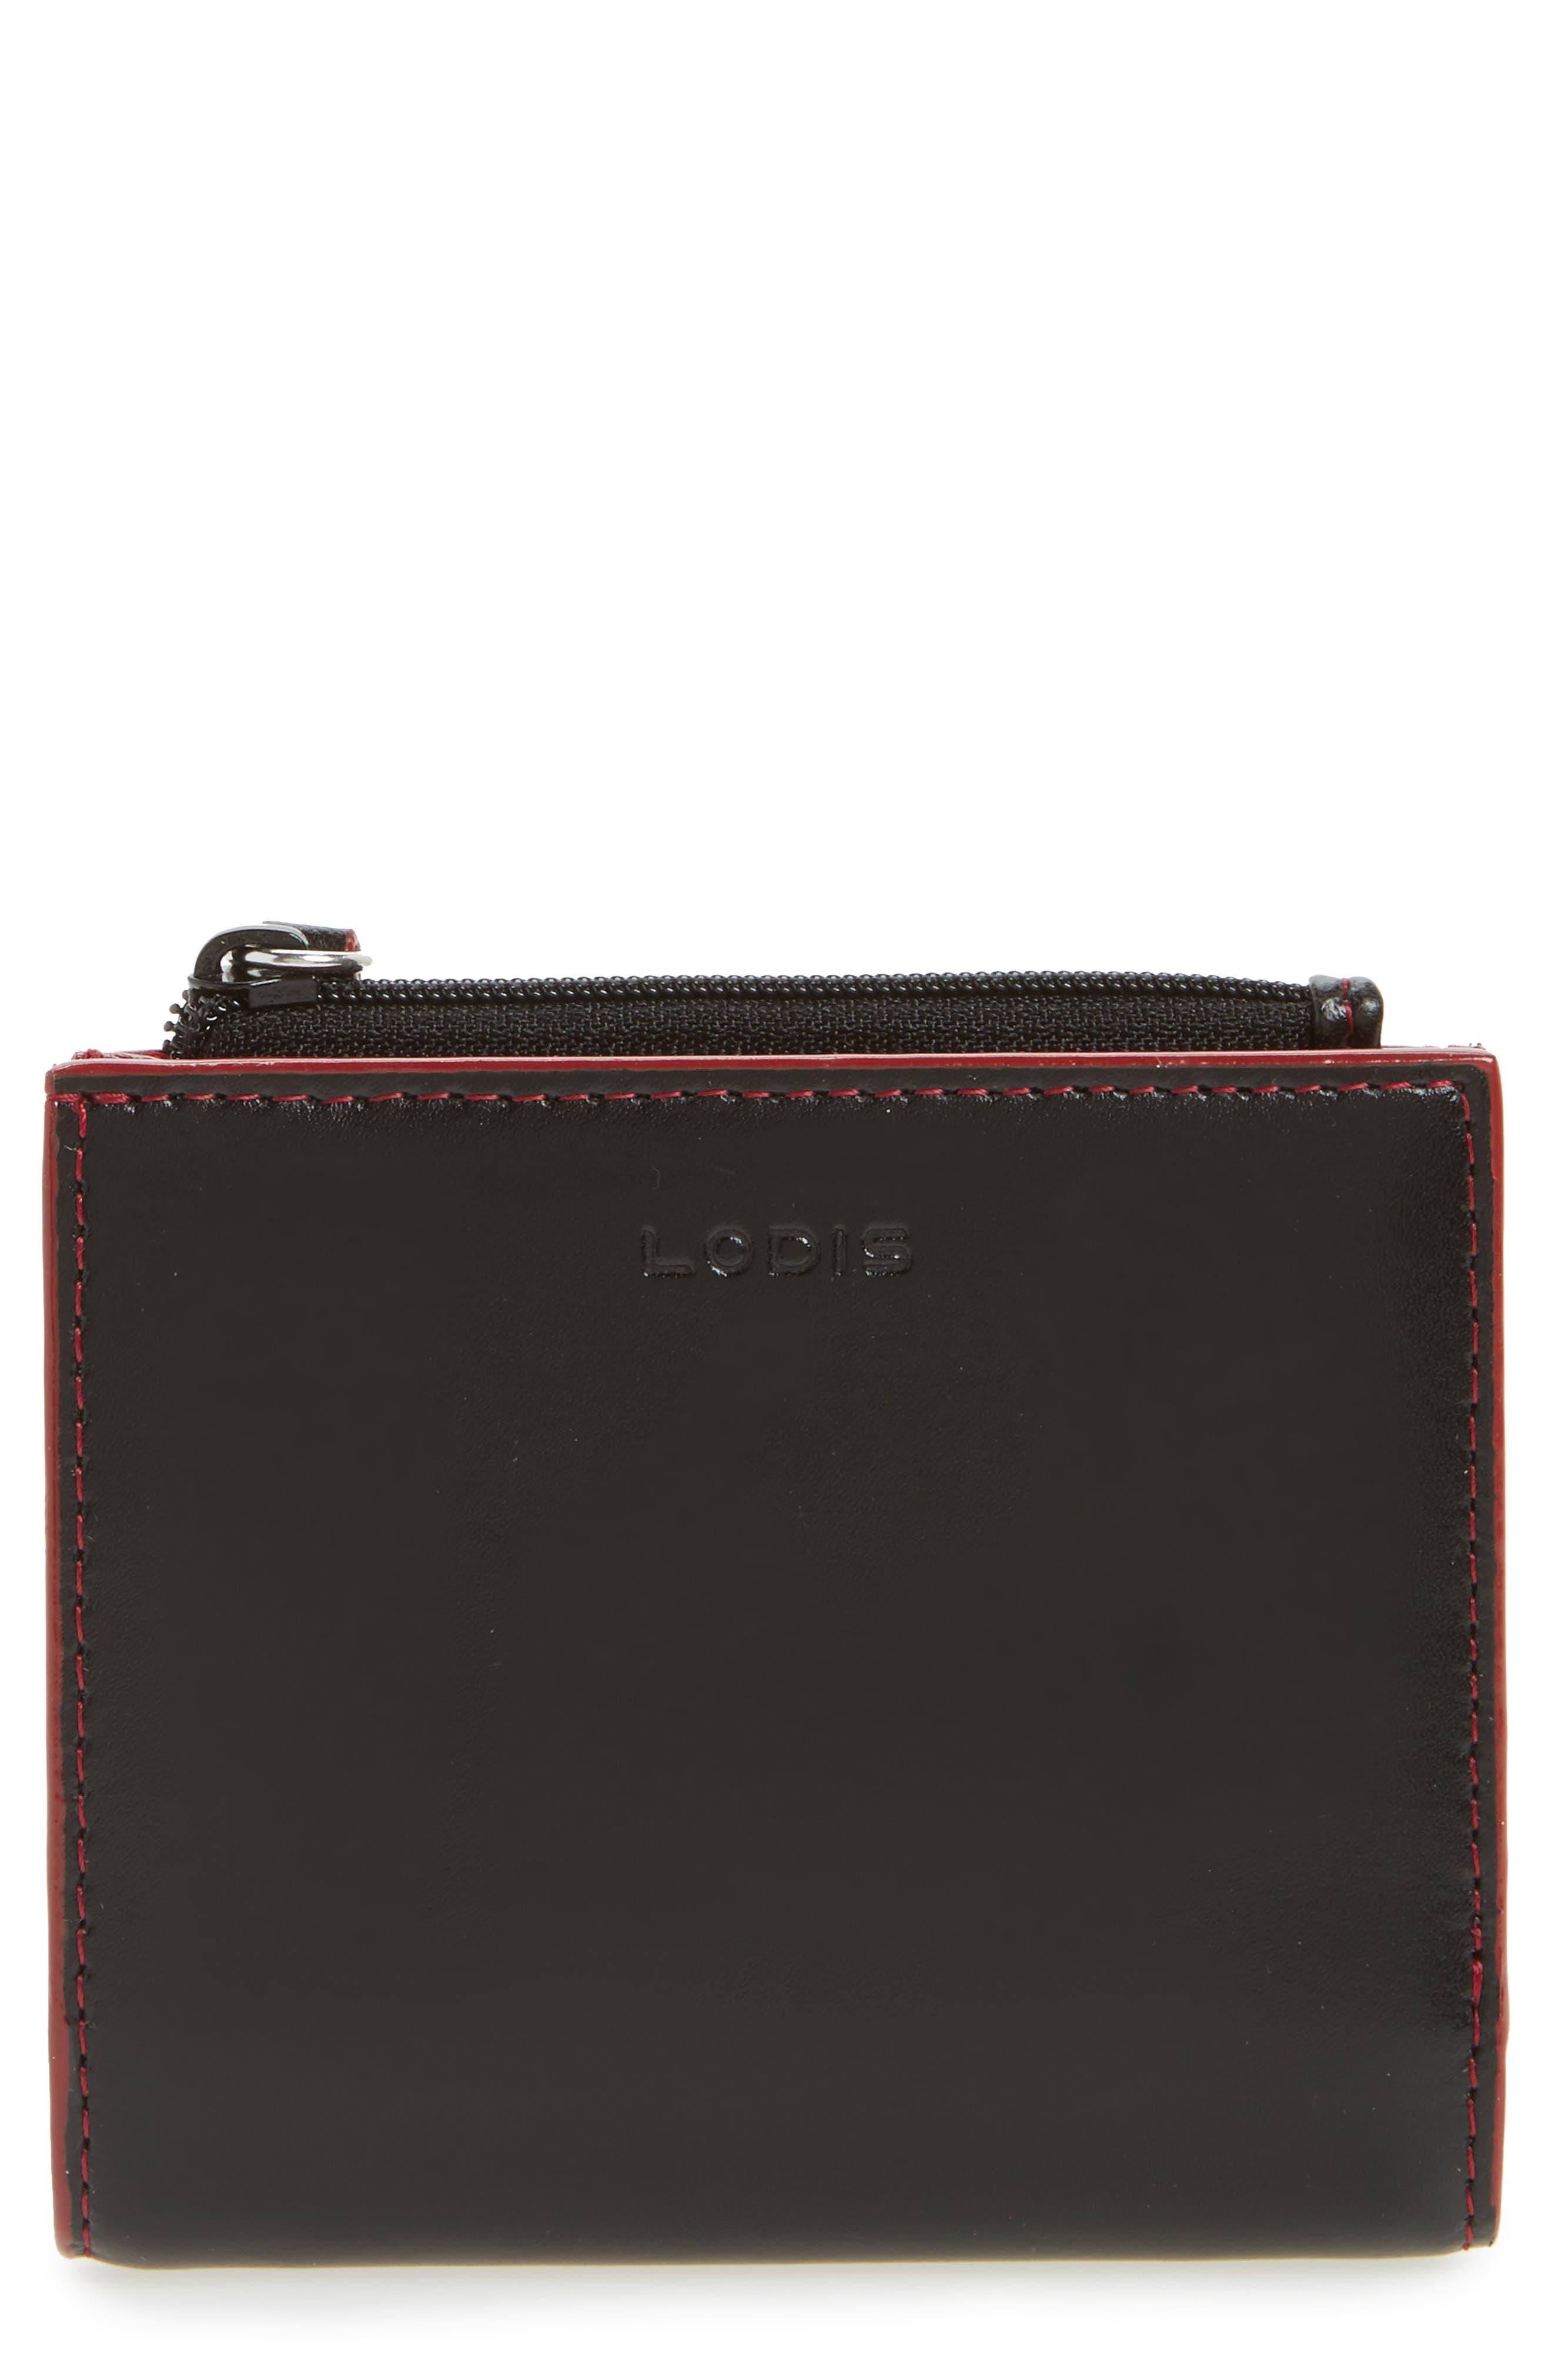 LODIS Los Angeles Audrey Under Lock & Key Aldis Leather Wallet